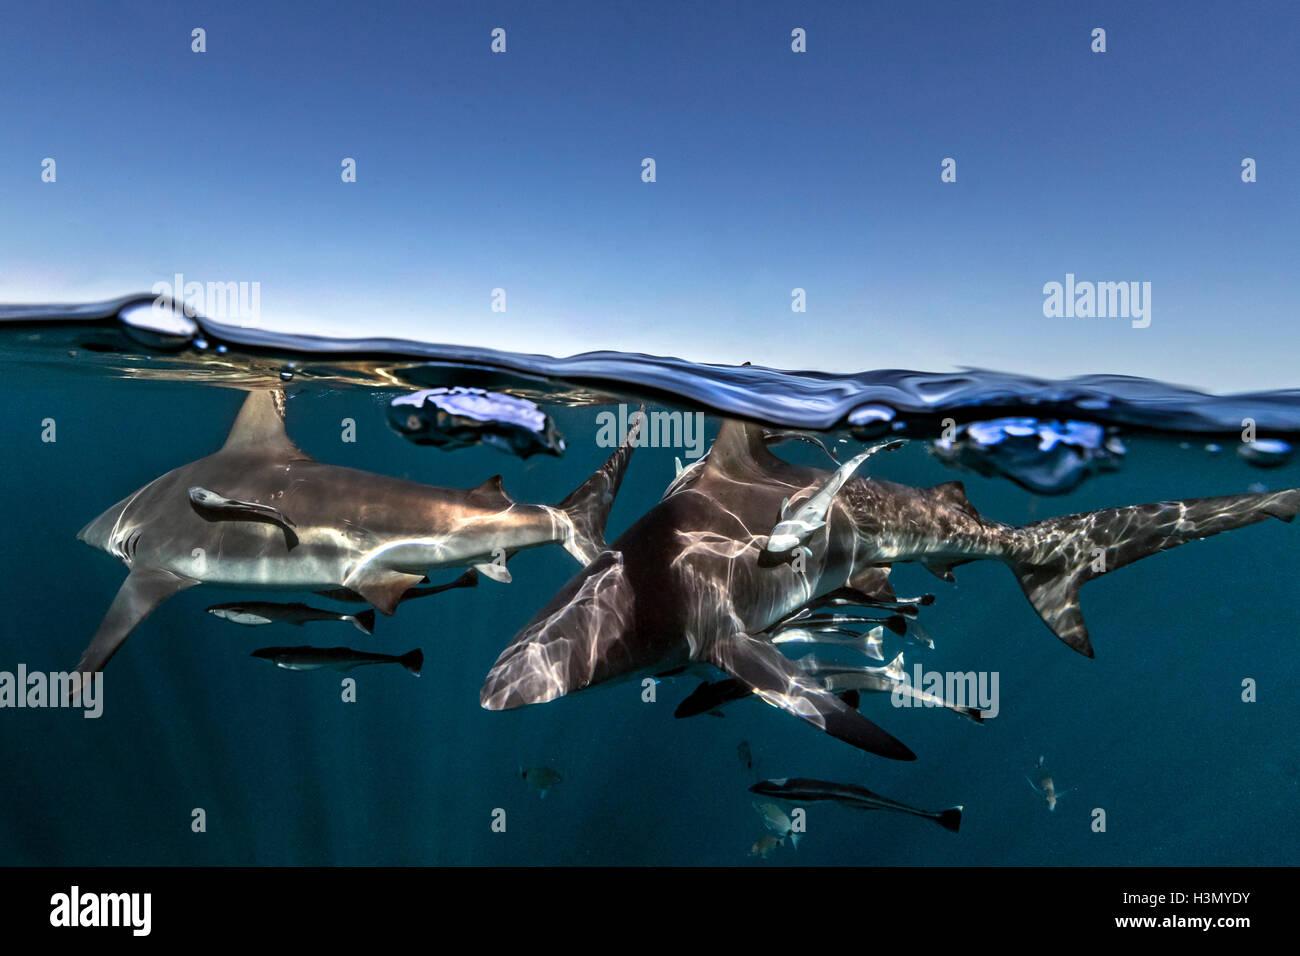 Oceanic Blacktip Sharks (Carcharhinus Limbatus) swimming near surface of ocean, Aliwal Shoal, South Africa Stock Photo